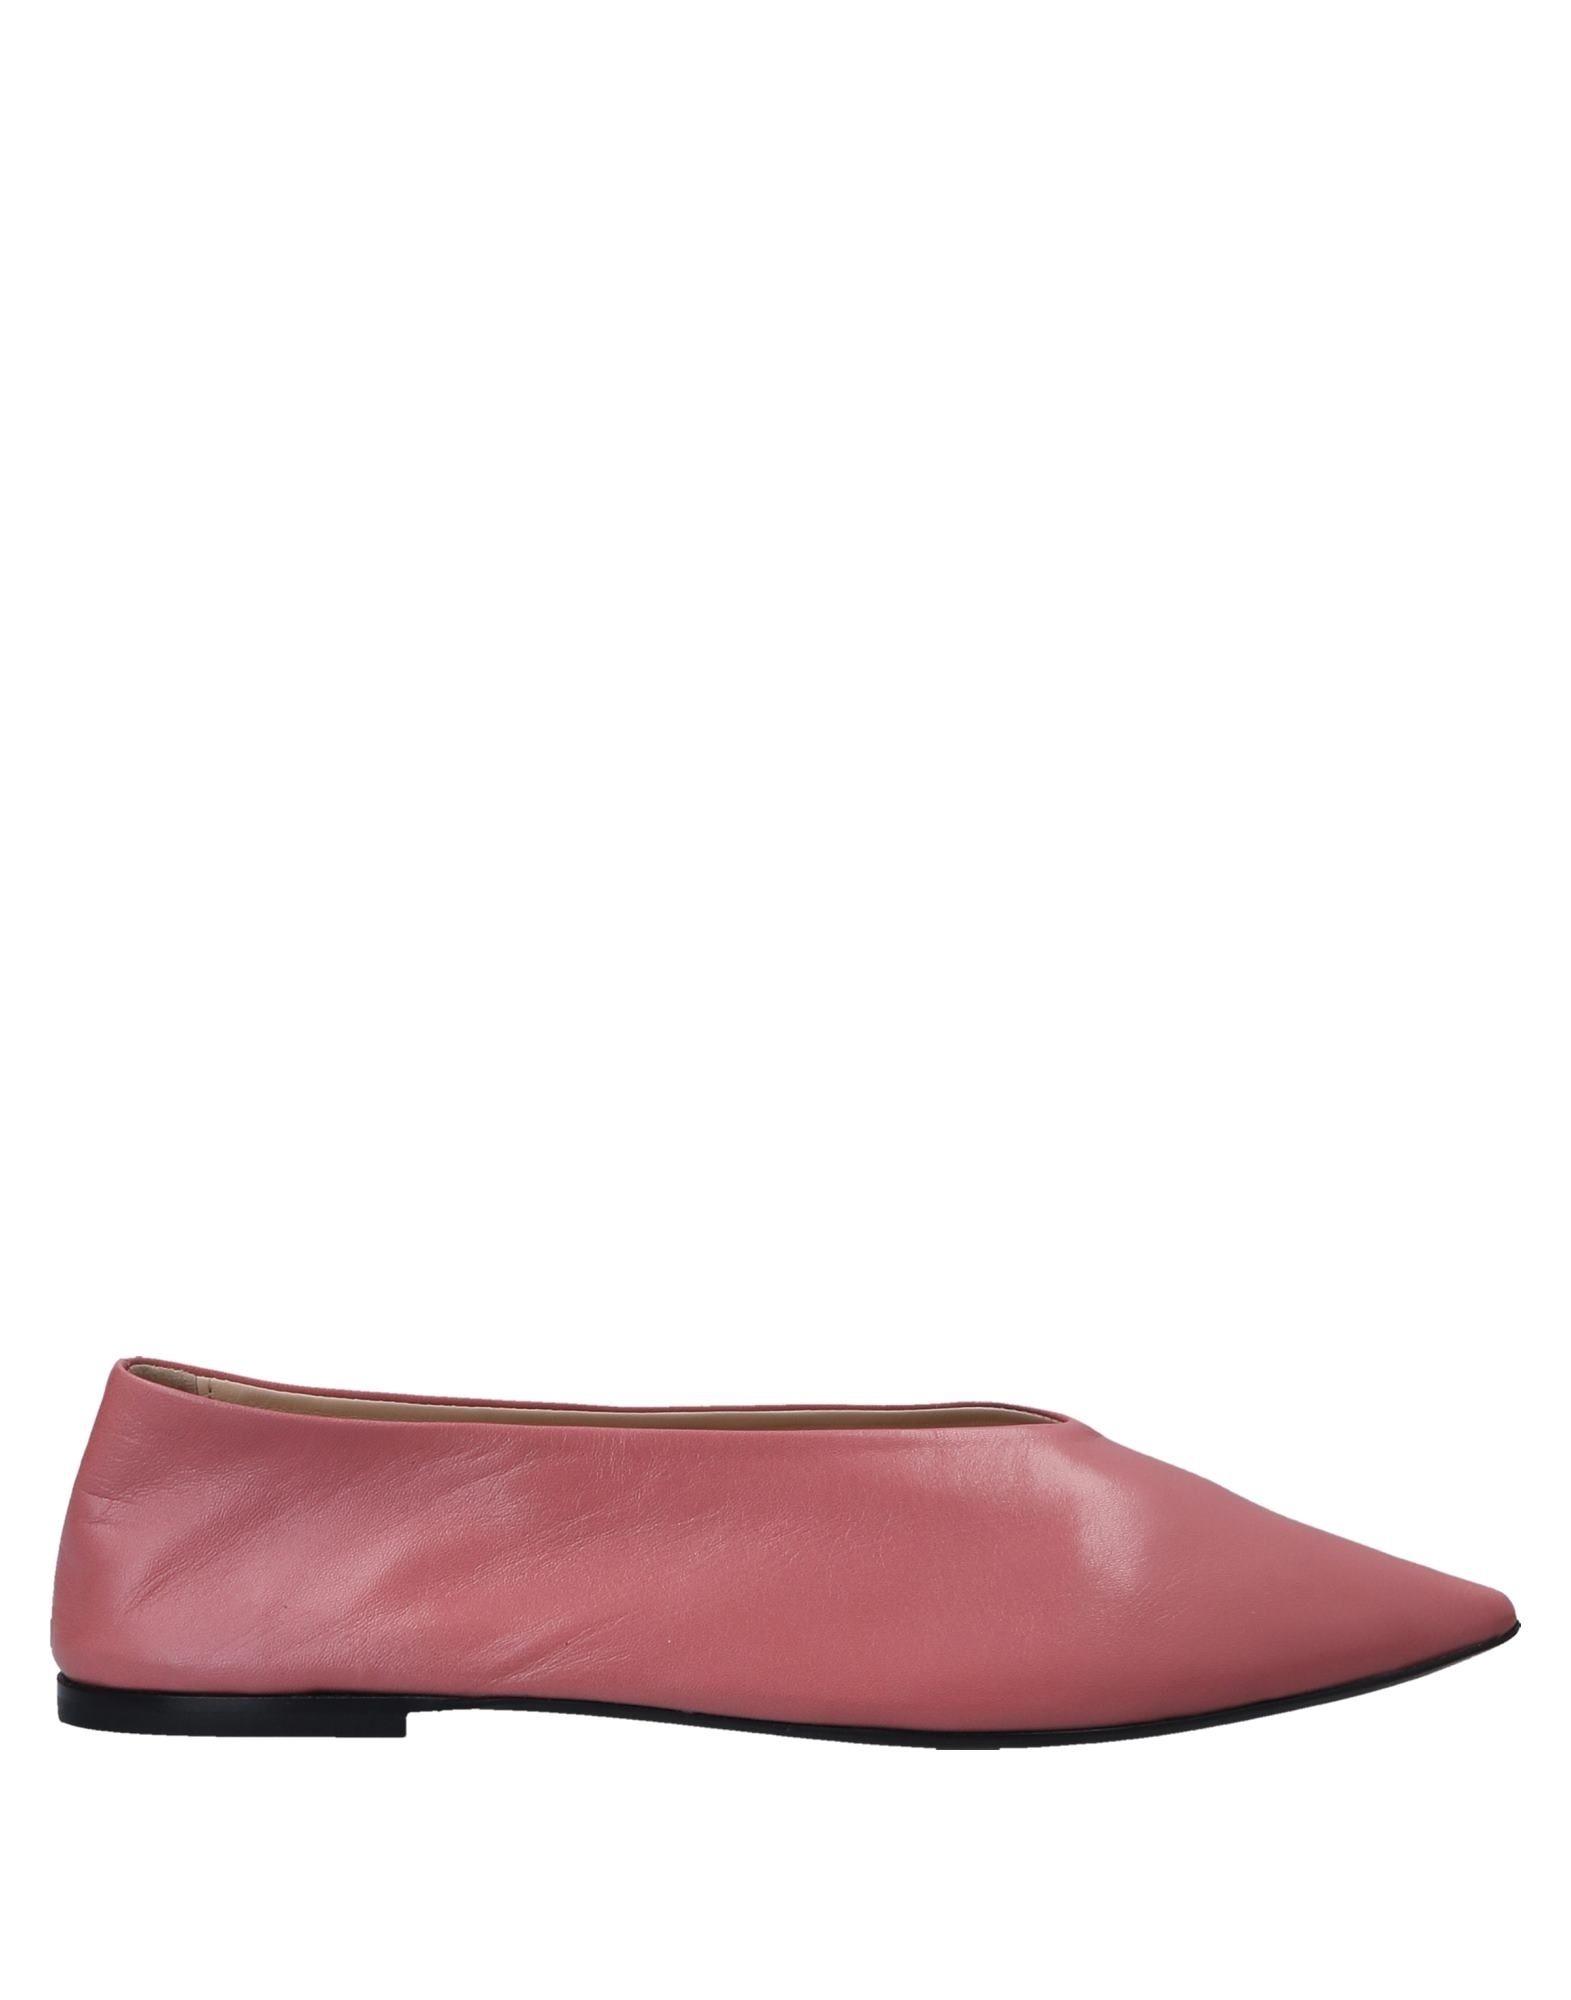 Rabatt Schuhe Erika 11558977LD Cavallini Ballerinas Damen  11558977LD Erika b38fc9